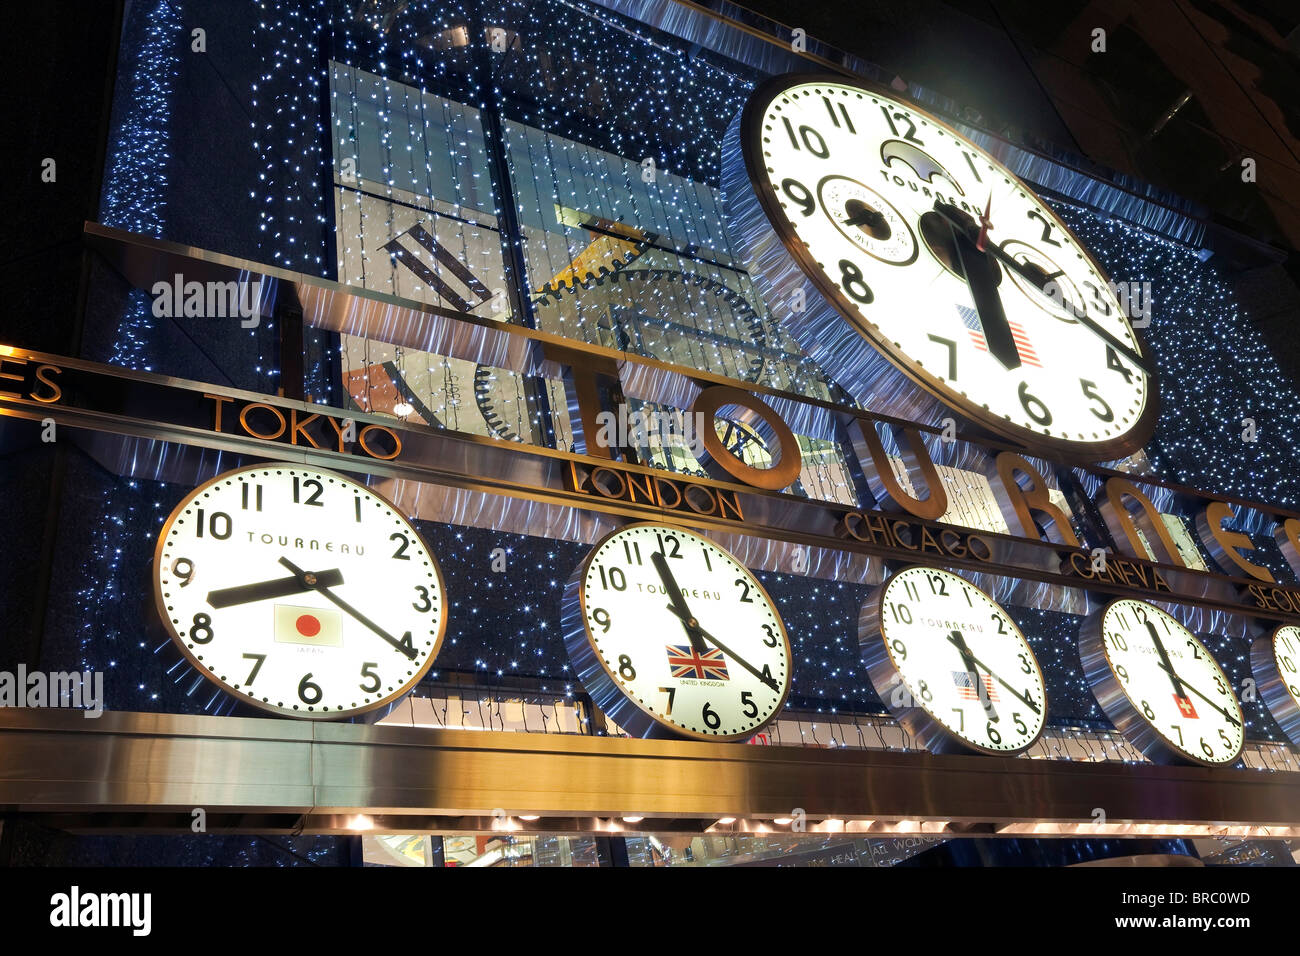 clocks showing various world